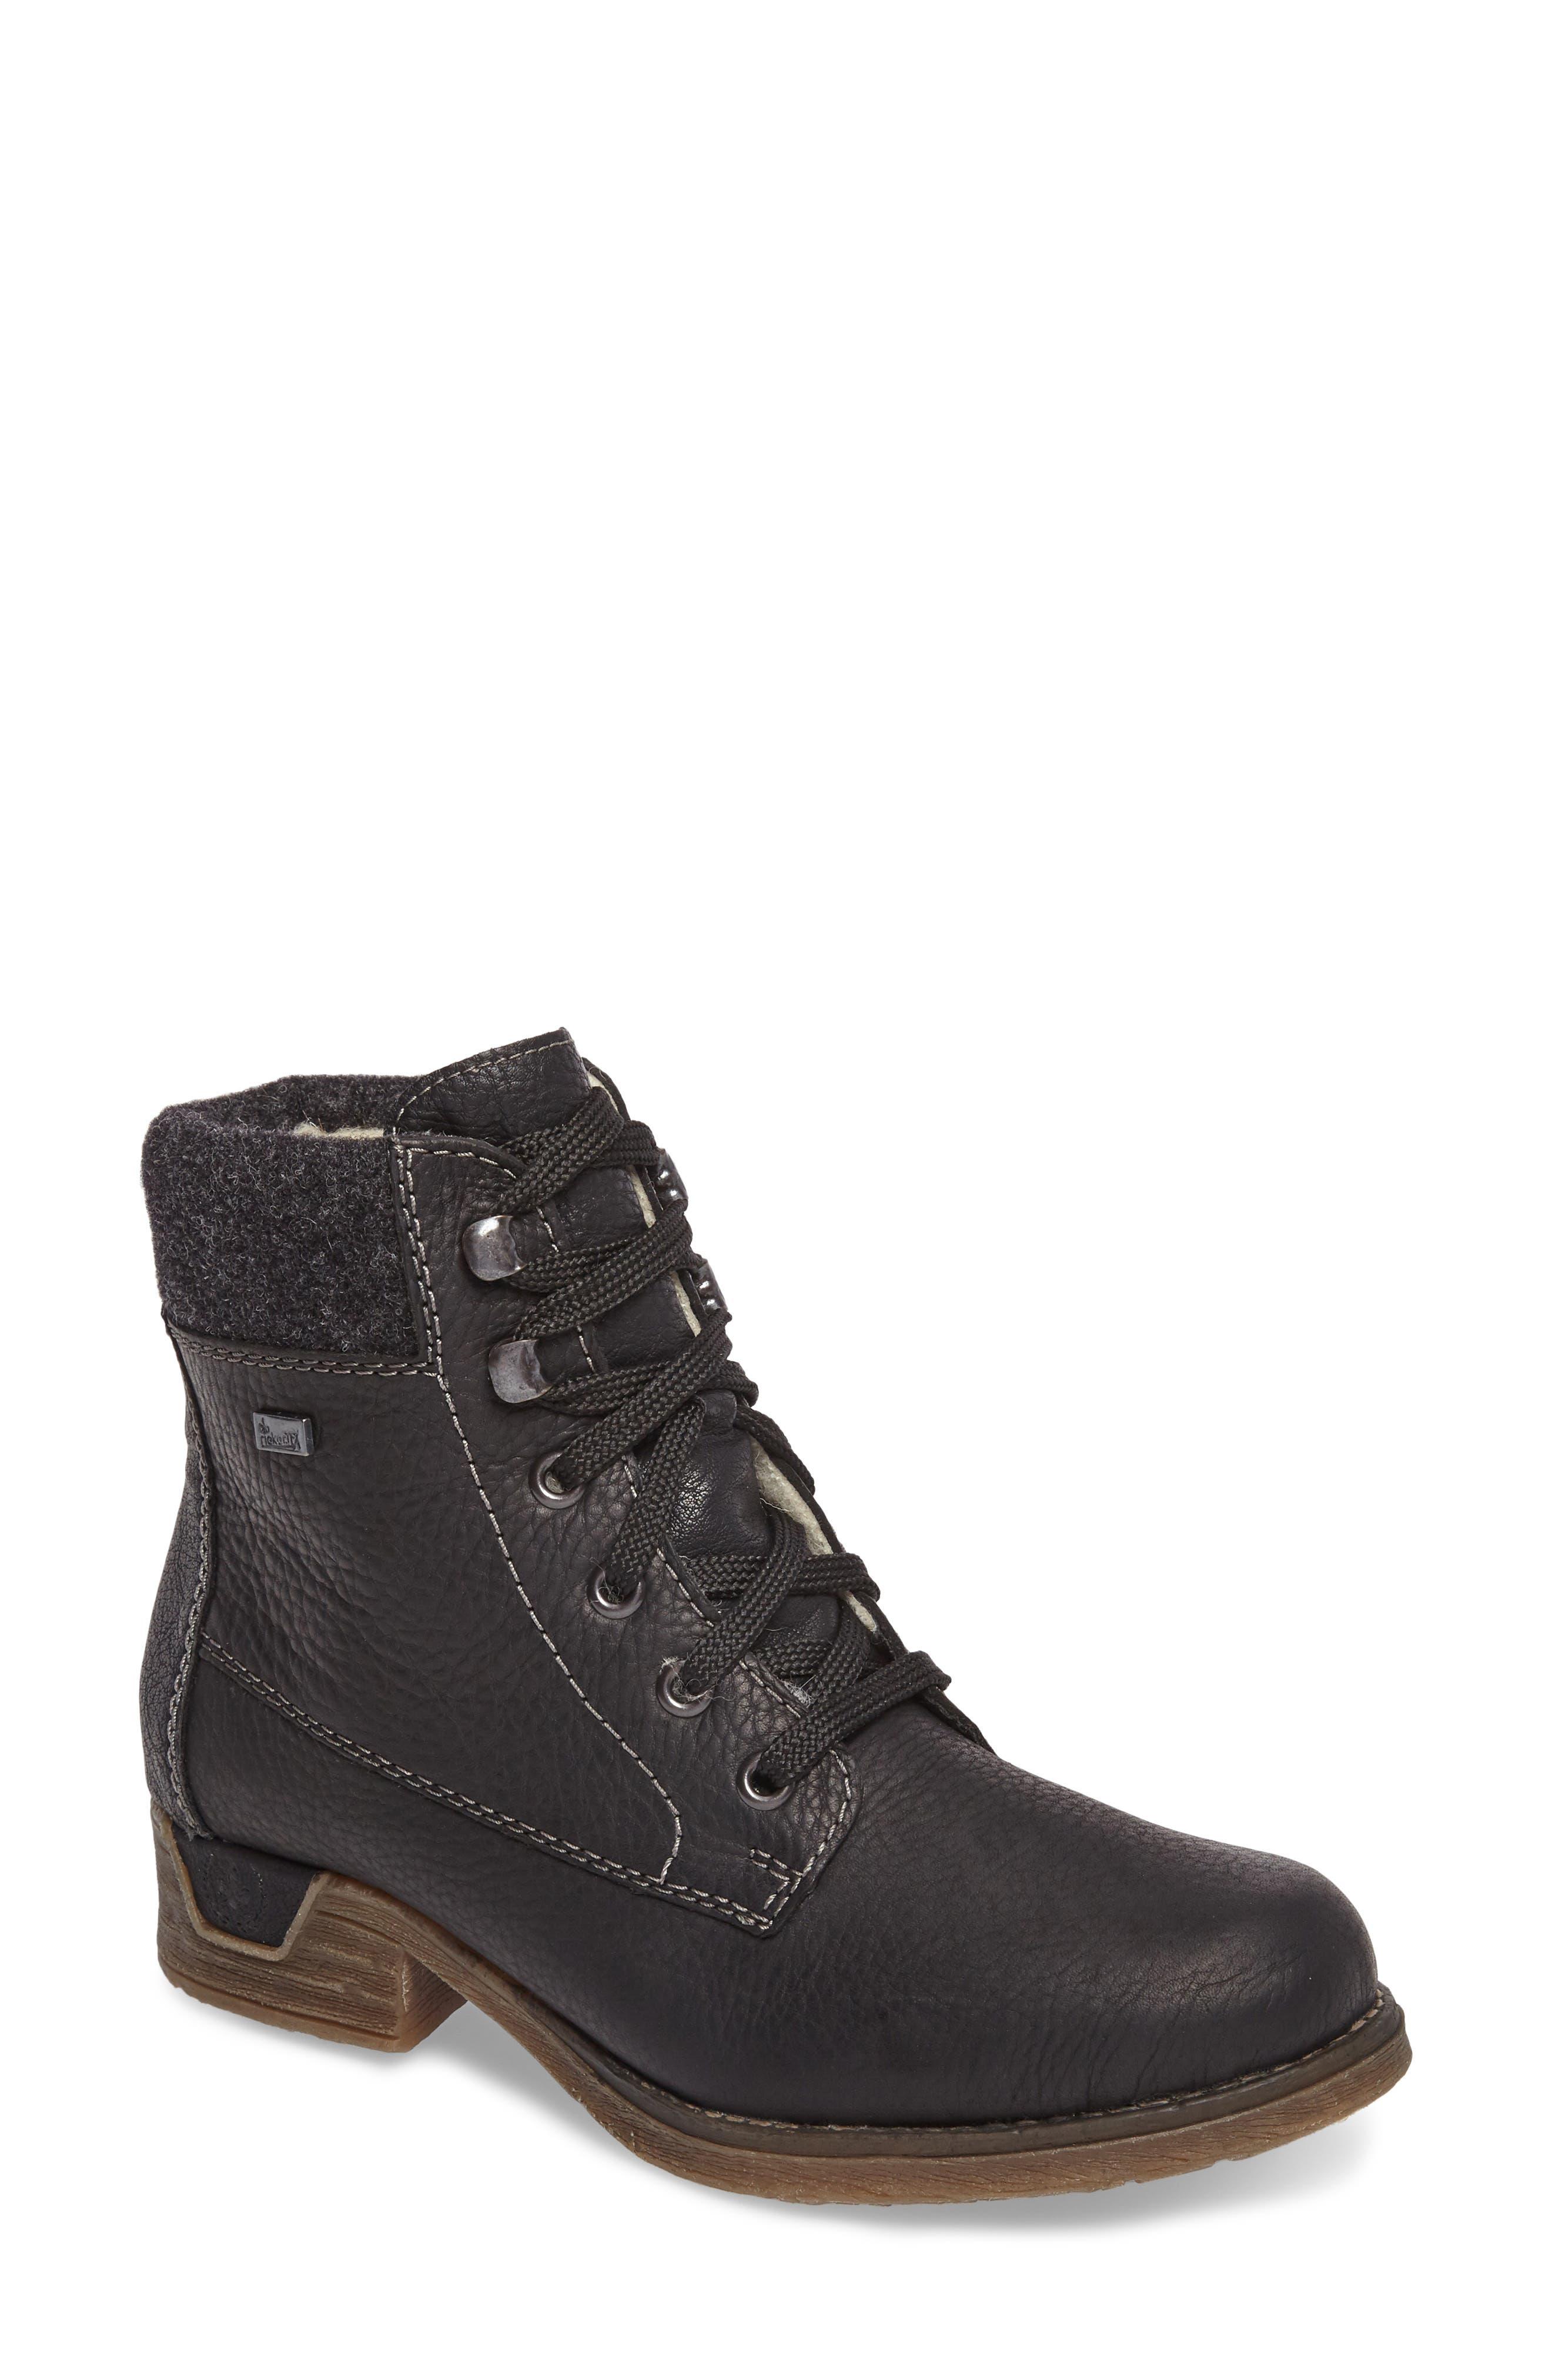 Rieker Antistress Fee 02 Lace-Up Boot (Women)